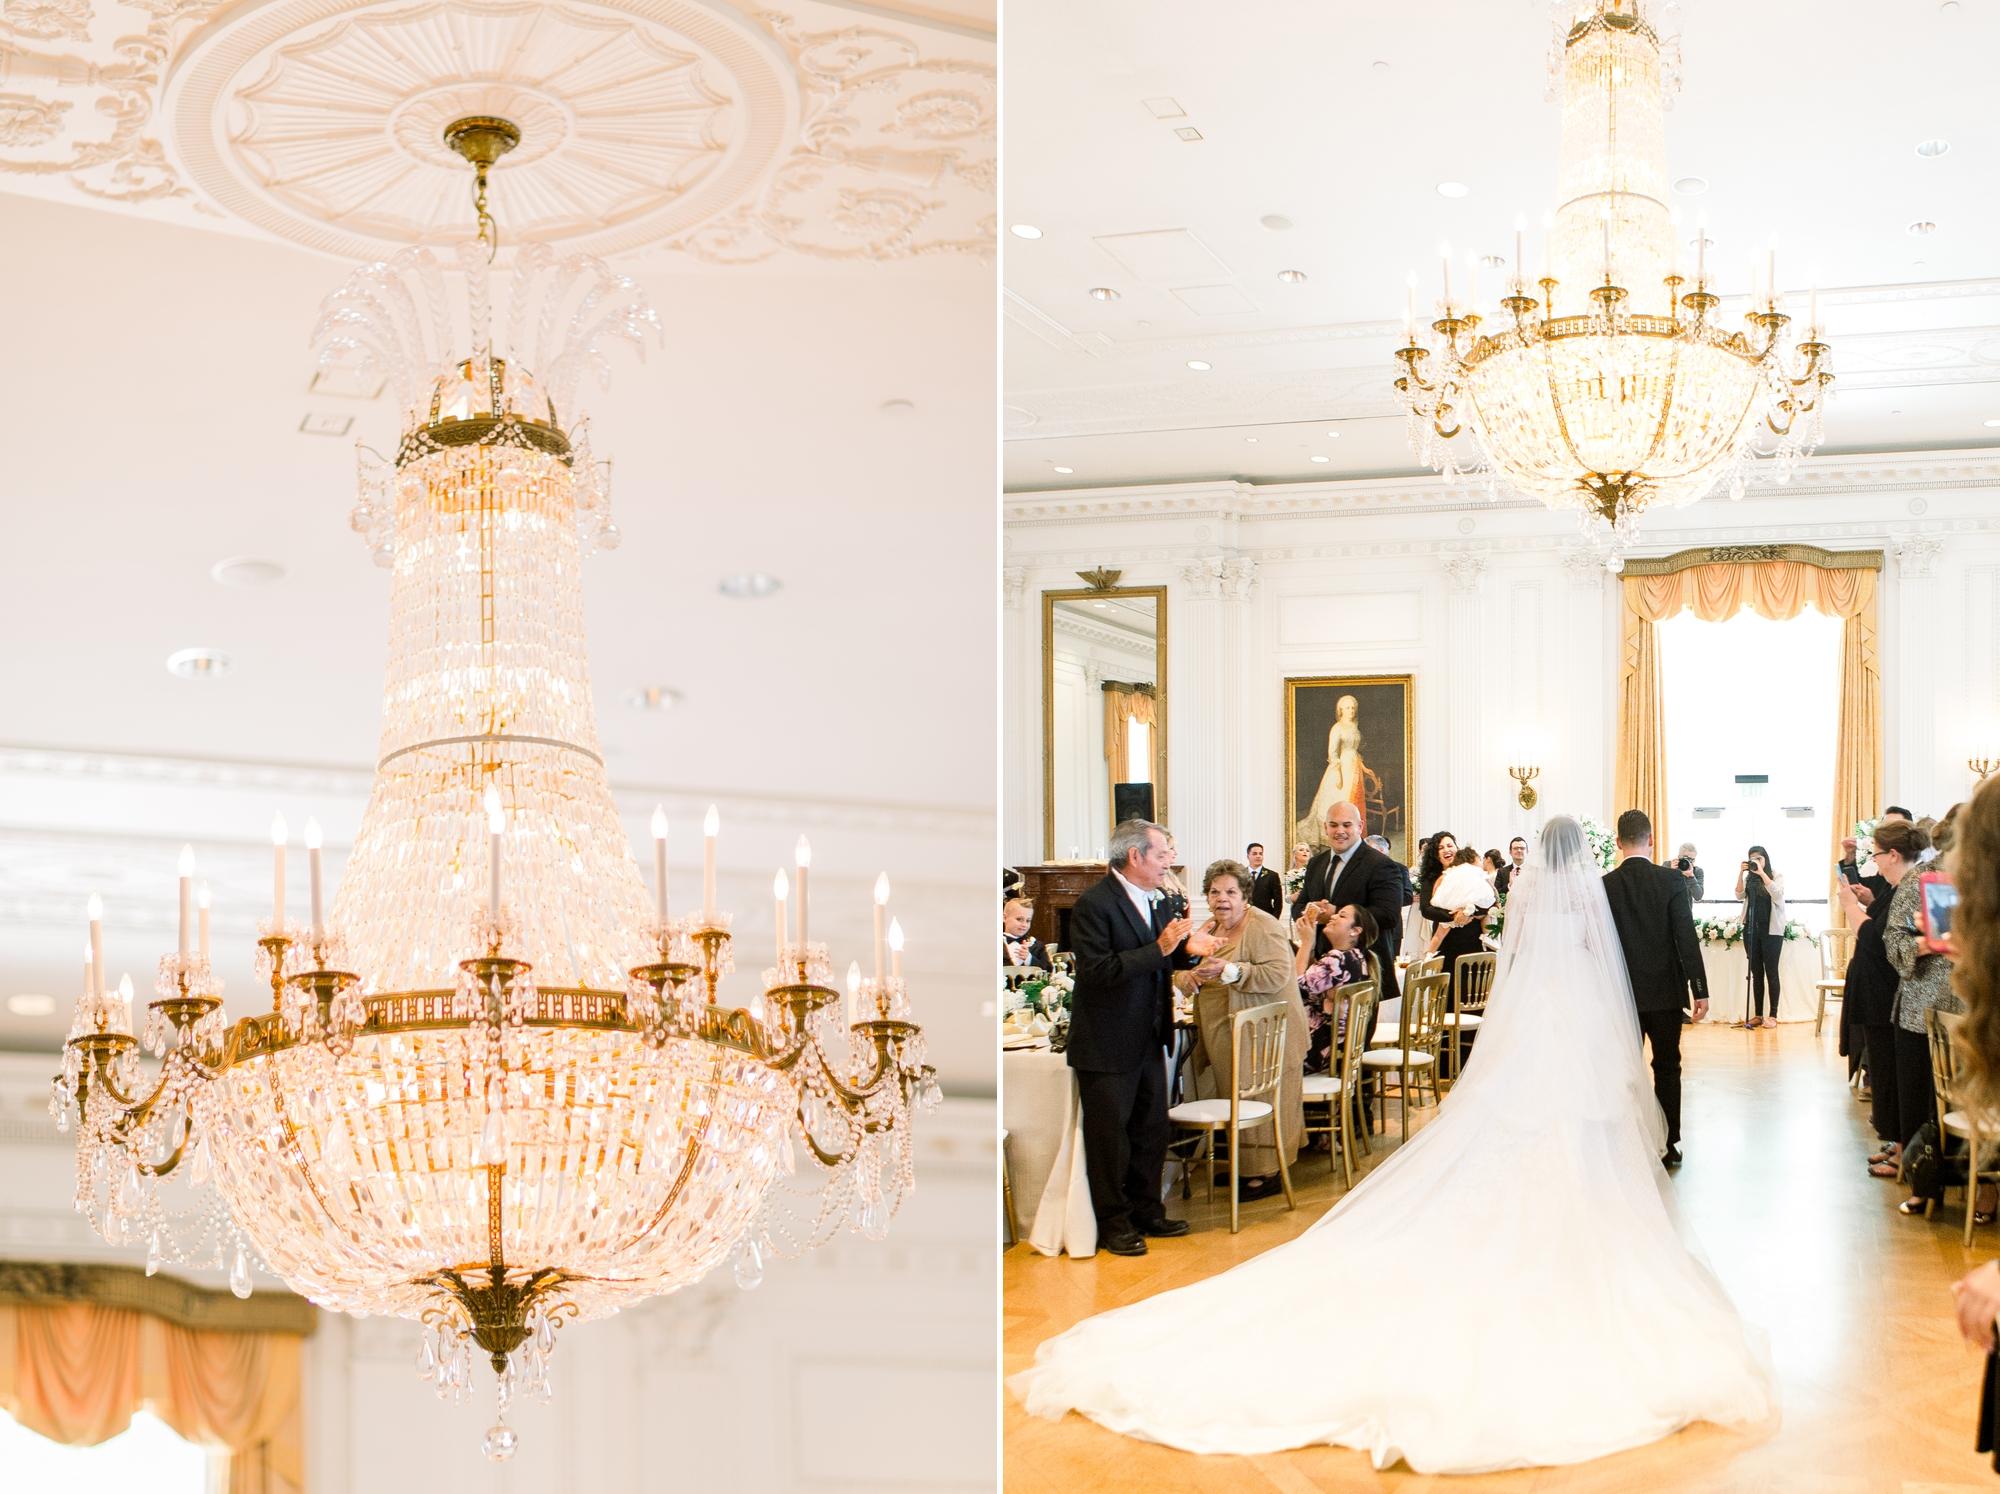 ROYAL-WEDDING-RICHARD-NIXON-LIBRARY 9.jpg